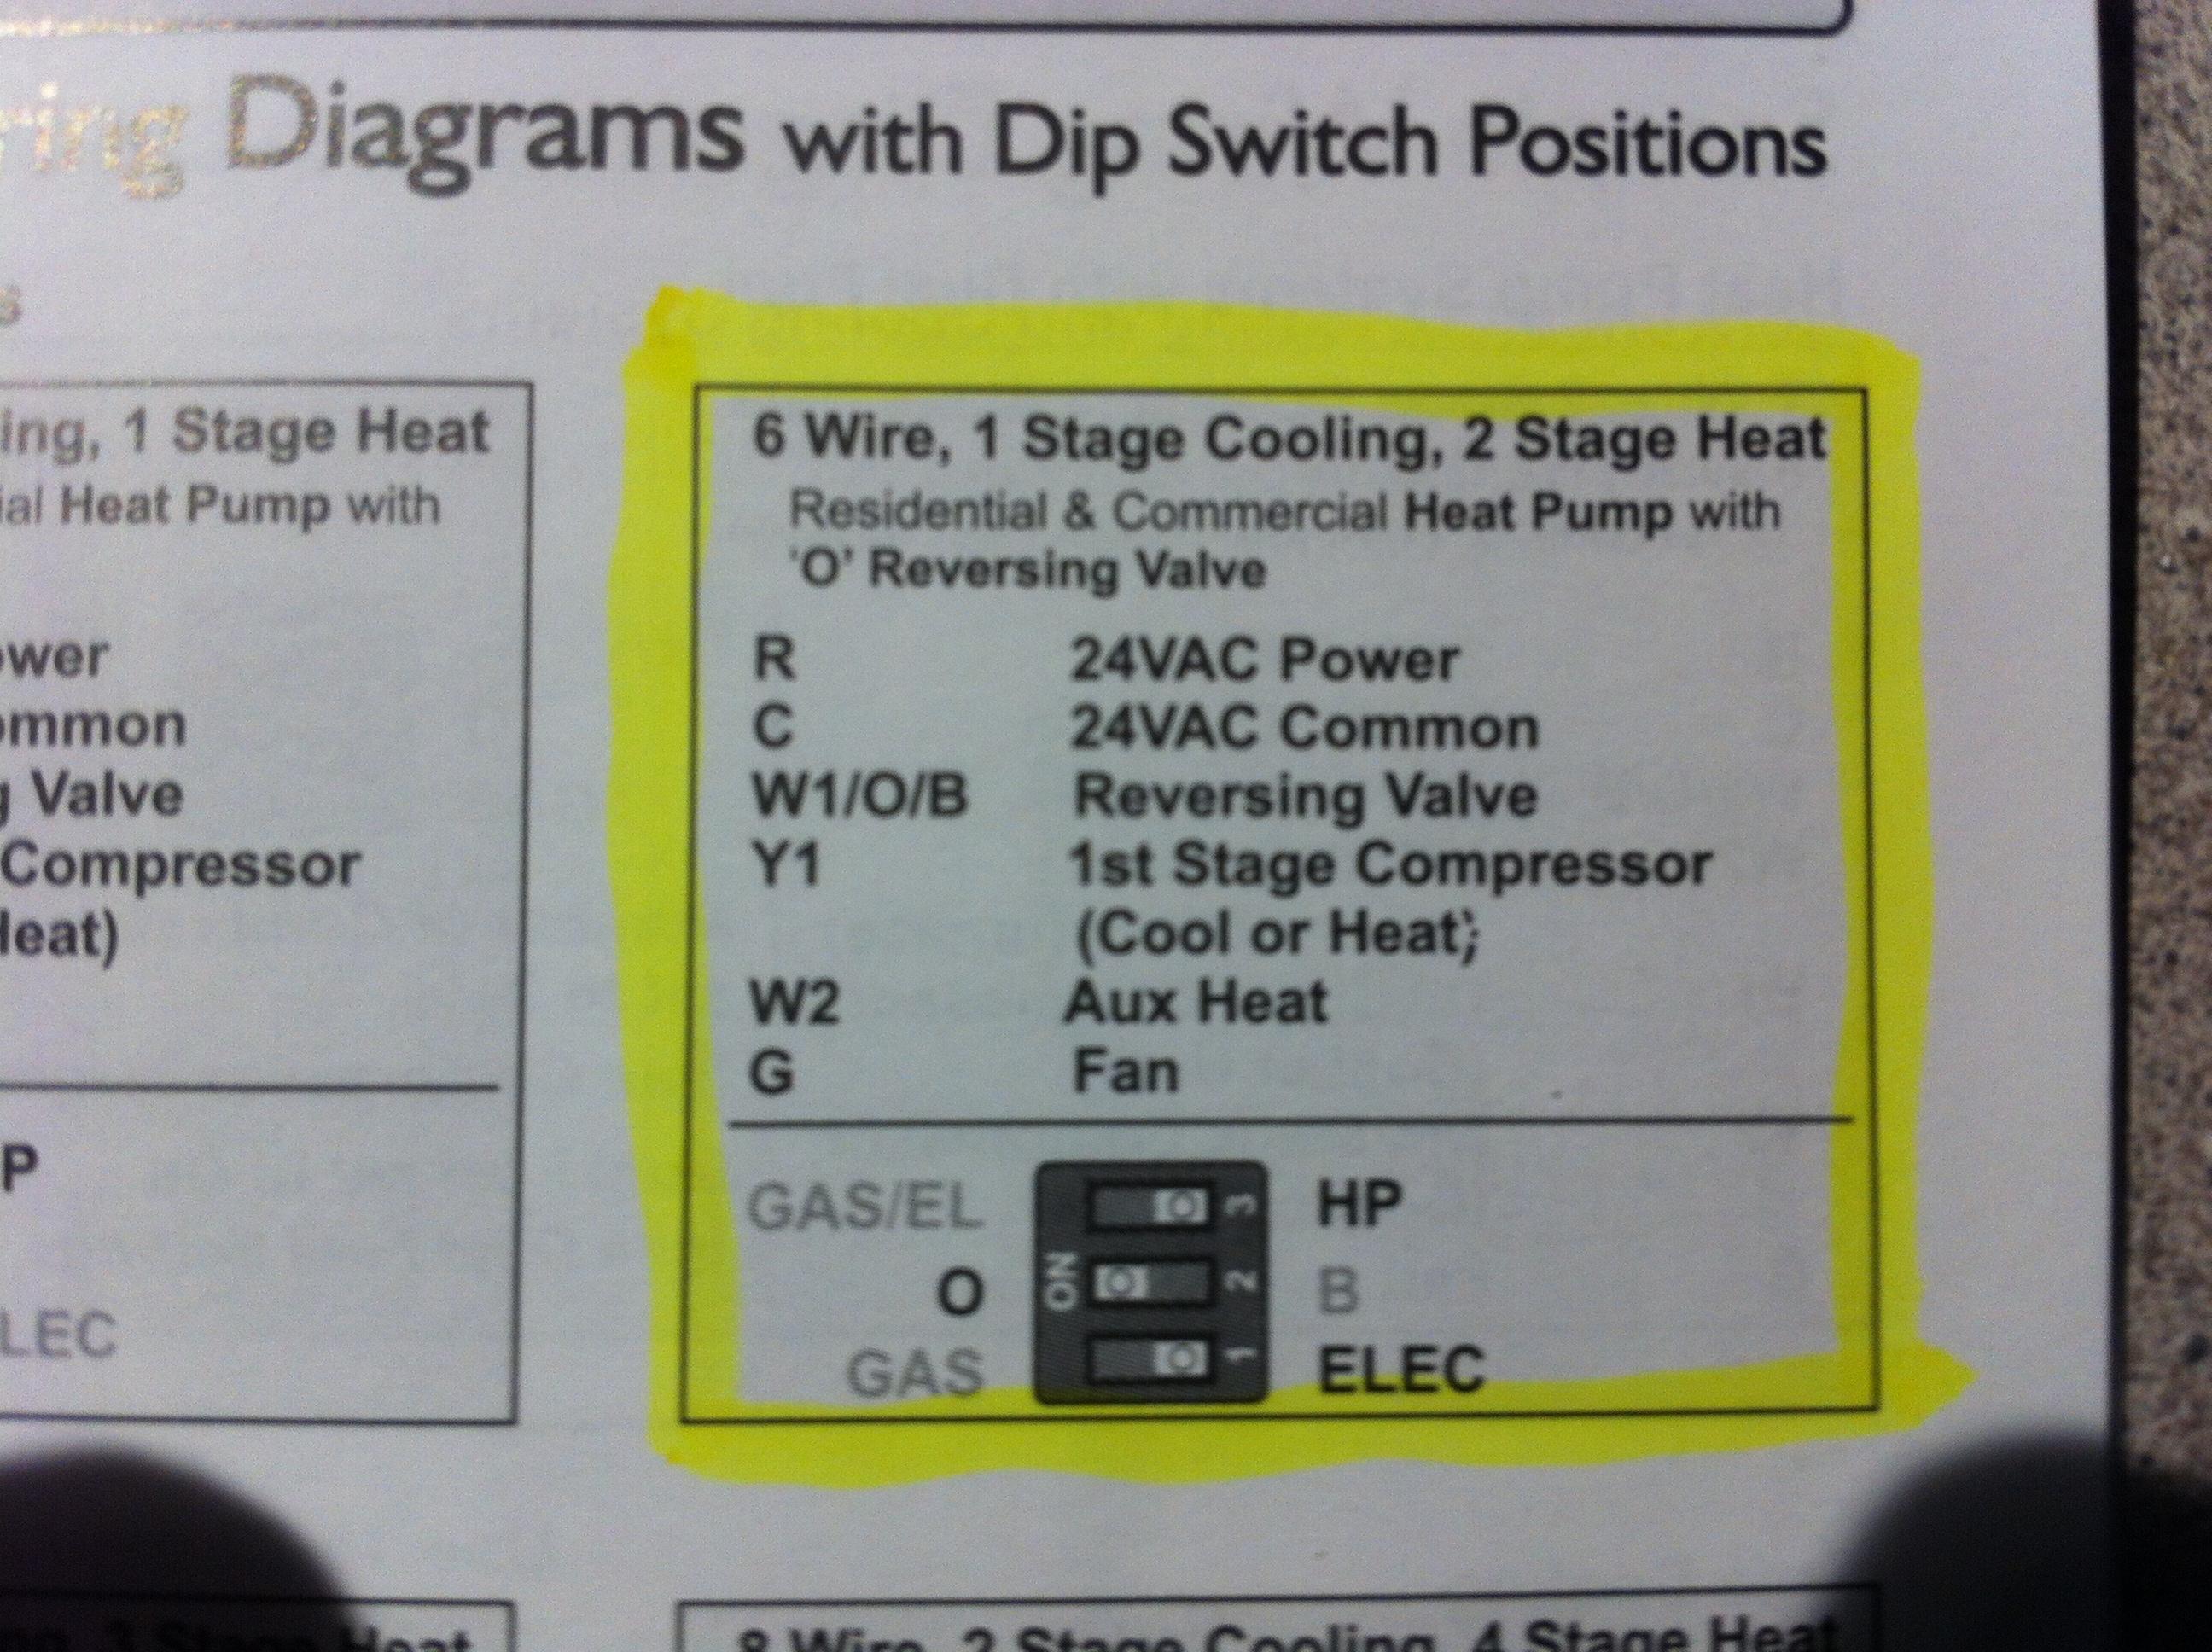 2 stage heat pump thermostat wiring 2 image wiring w1 w2 thermostat wiring w1 auto wiring diagram schematic on 2 stage heat pump thermostat wiring